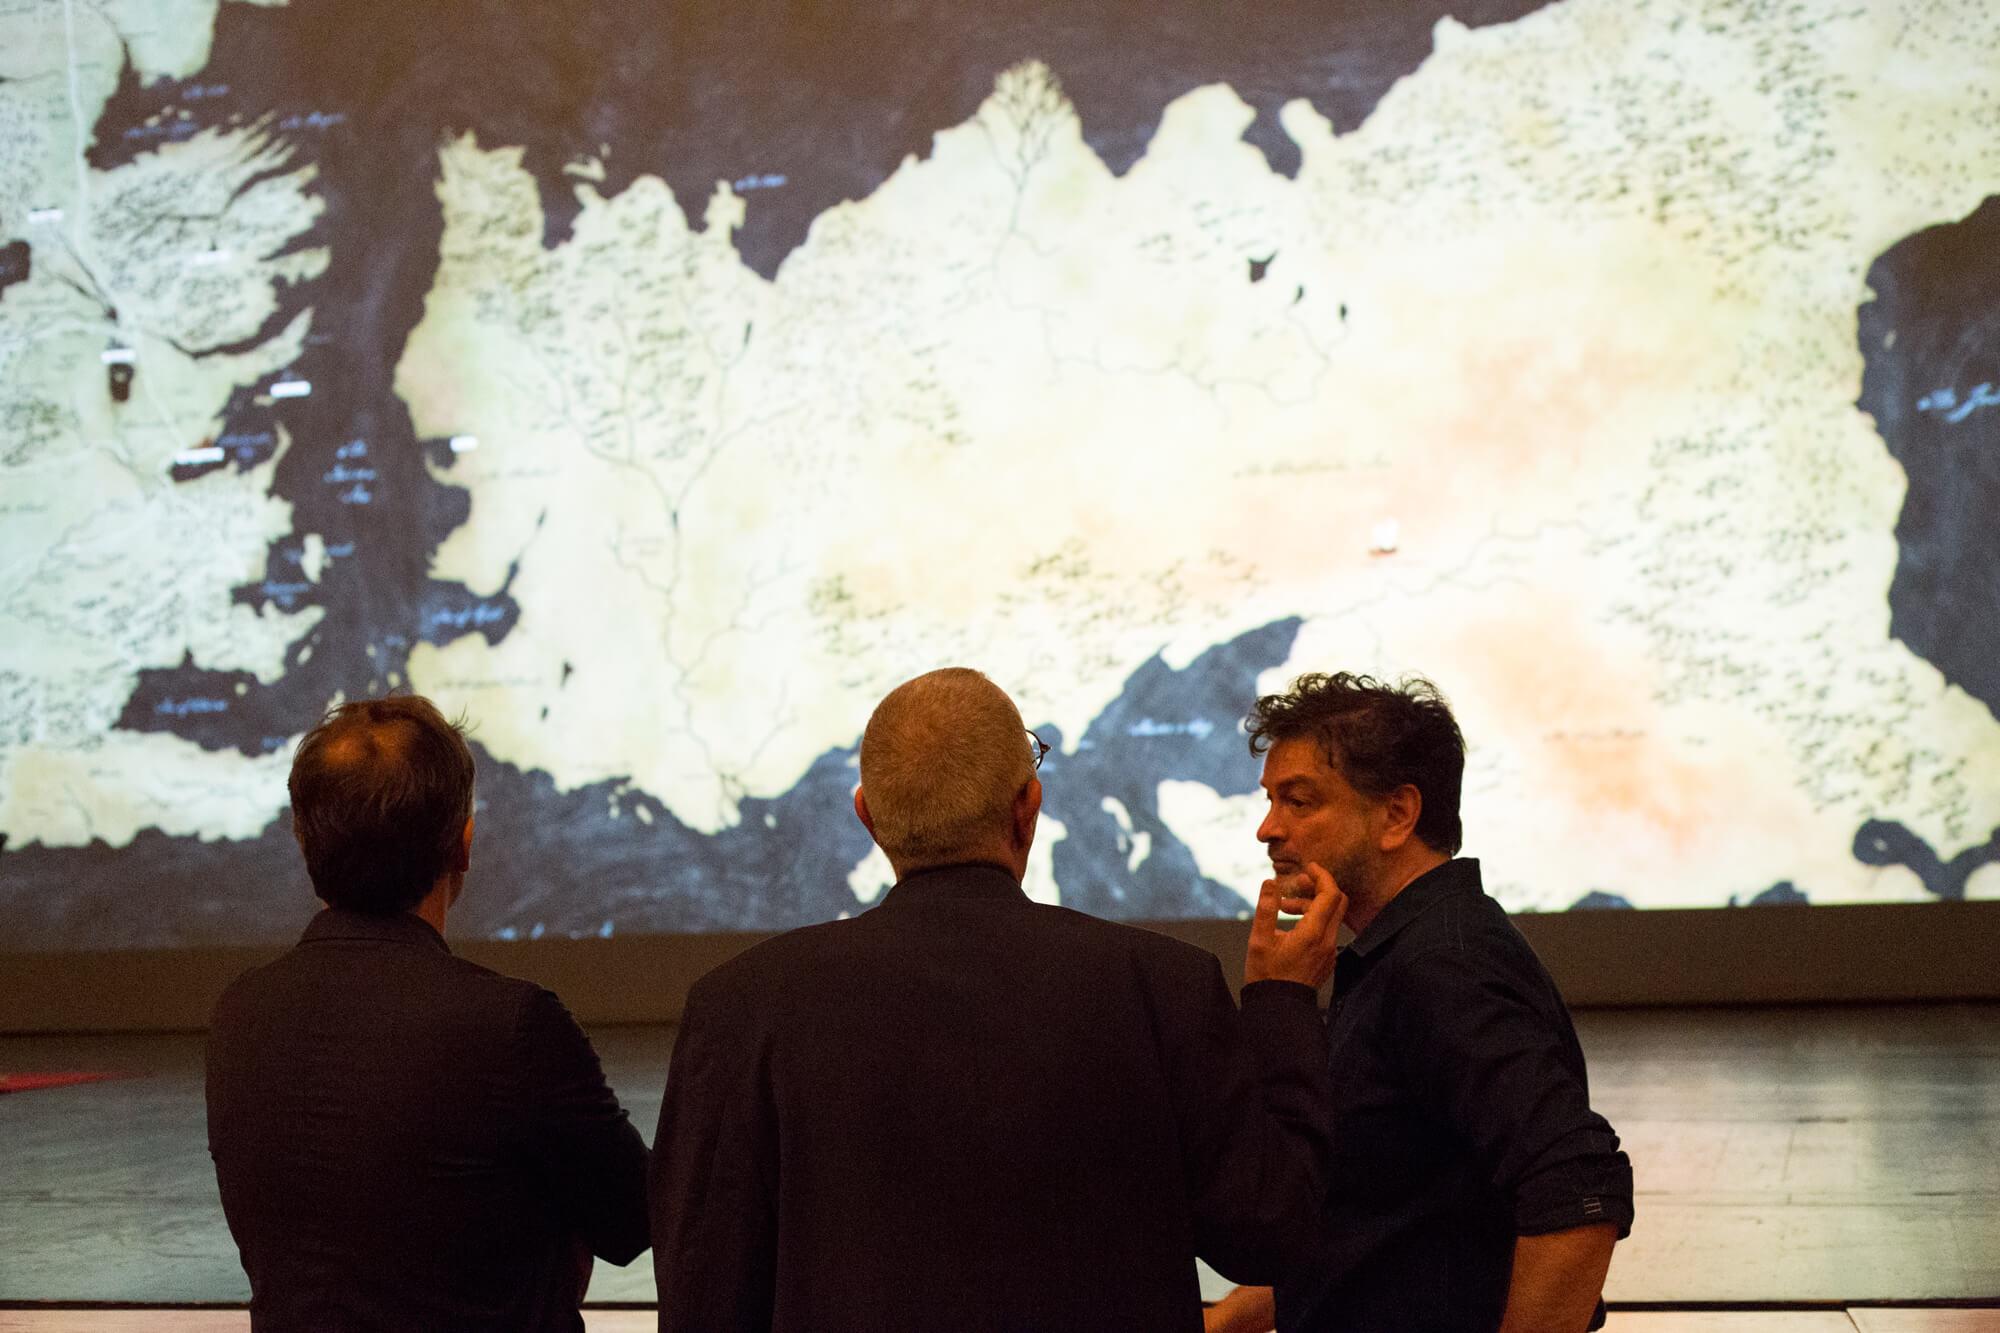 José Mateus, Paul Ghirardani e Manuel Graça Dias à conversa.